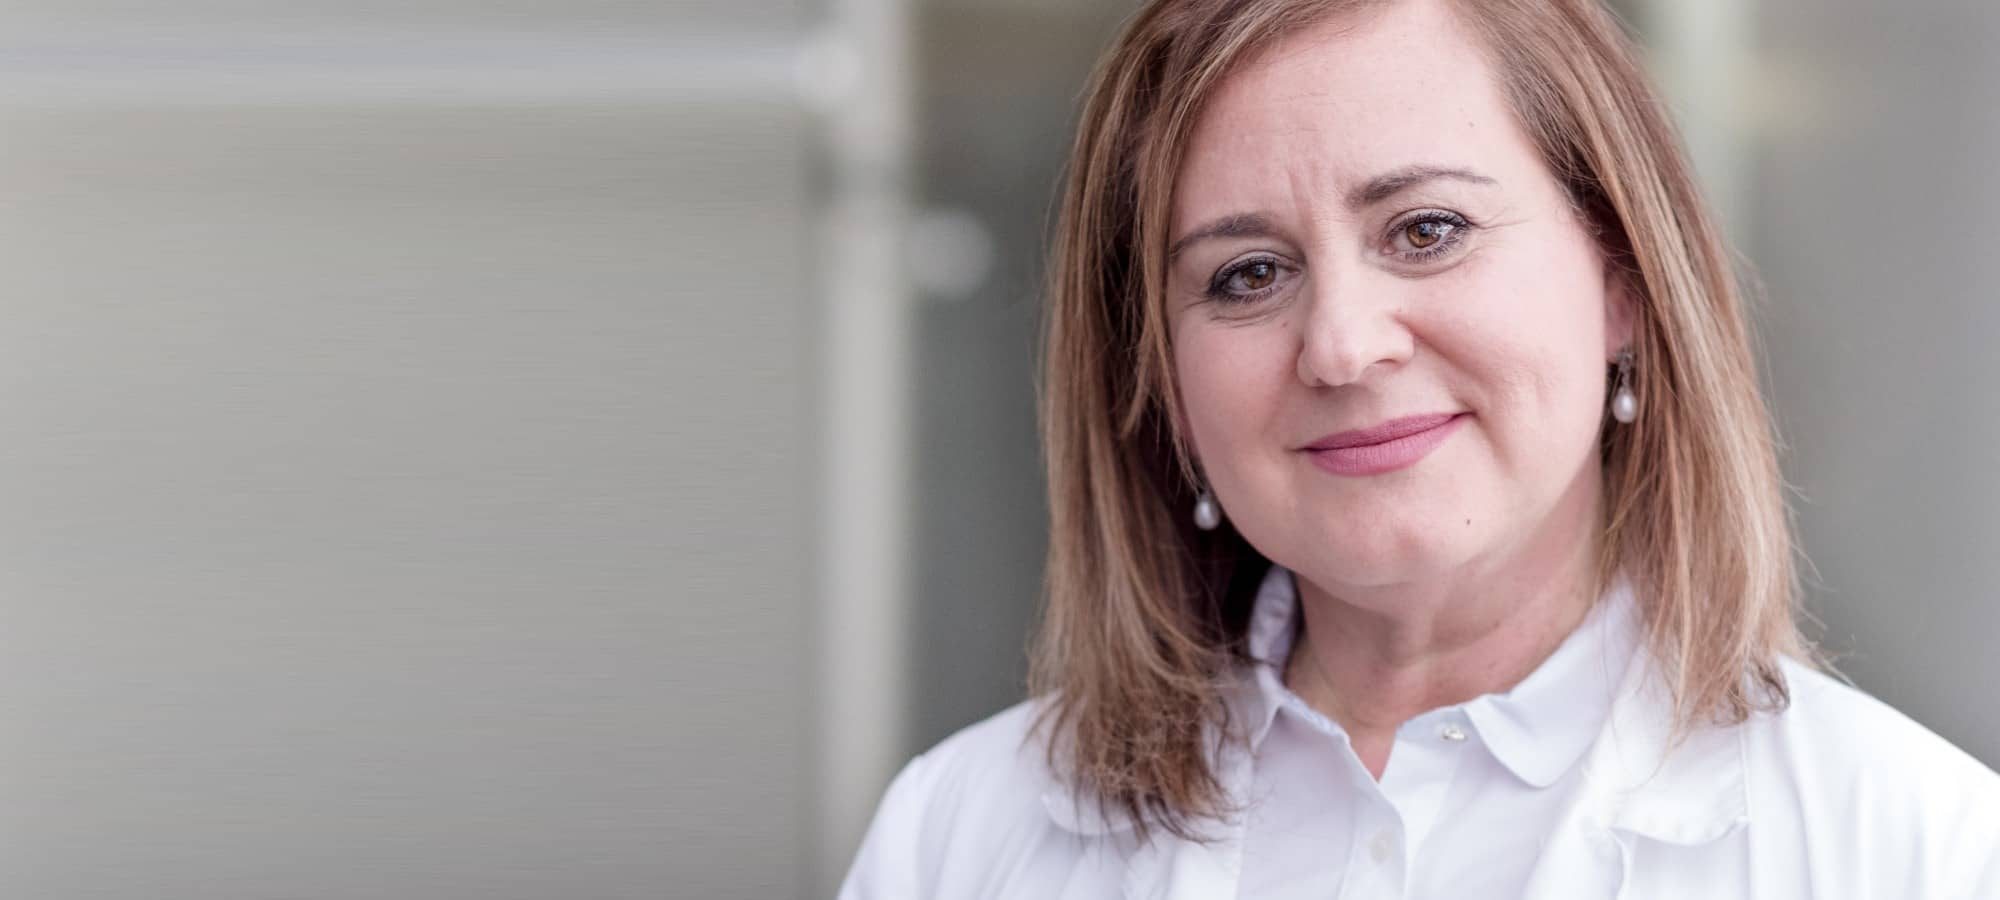 Zahnärztin Silvia Cukier de Horwitz   groisman & laube